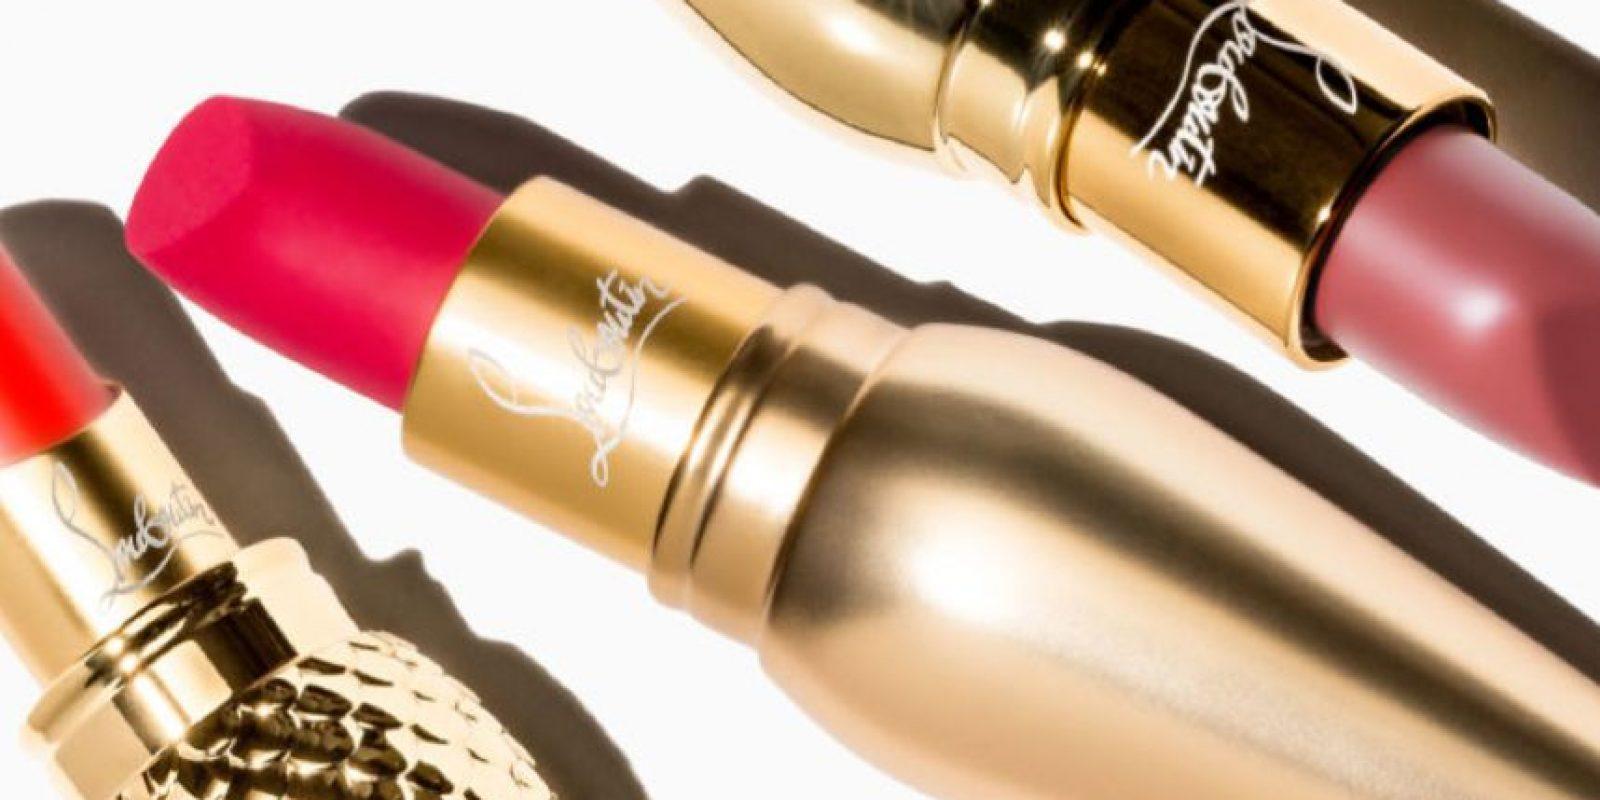 4. Christian Louboutin Beauté – lápiz labial sedoso en Sevillana US$90 / € 80 net-a-porter.com Foto:vía Net A Porter